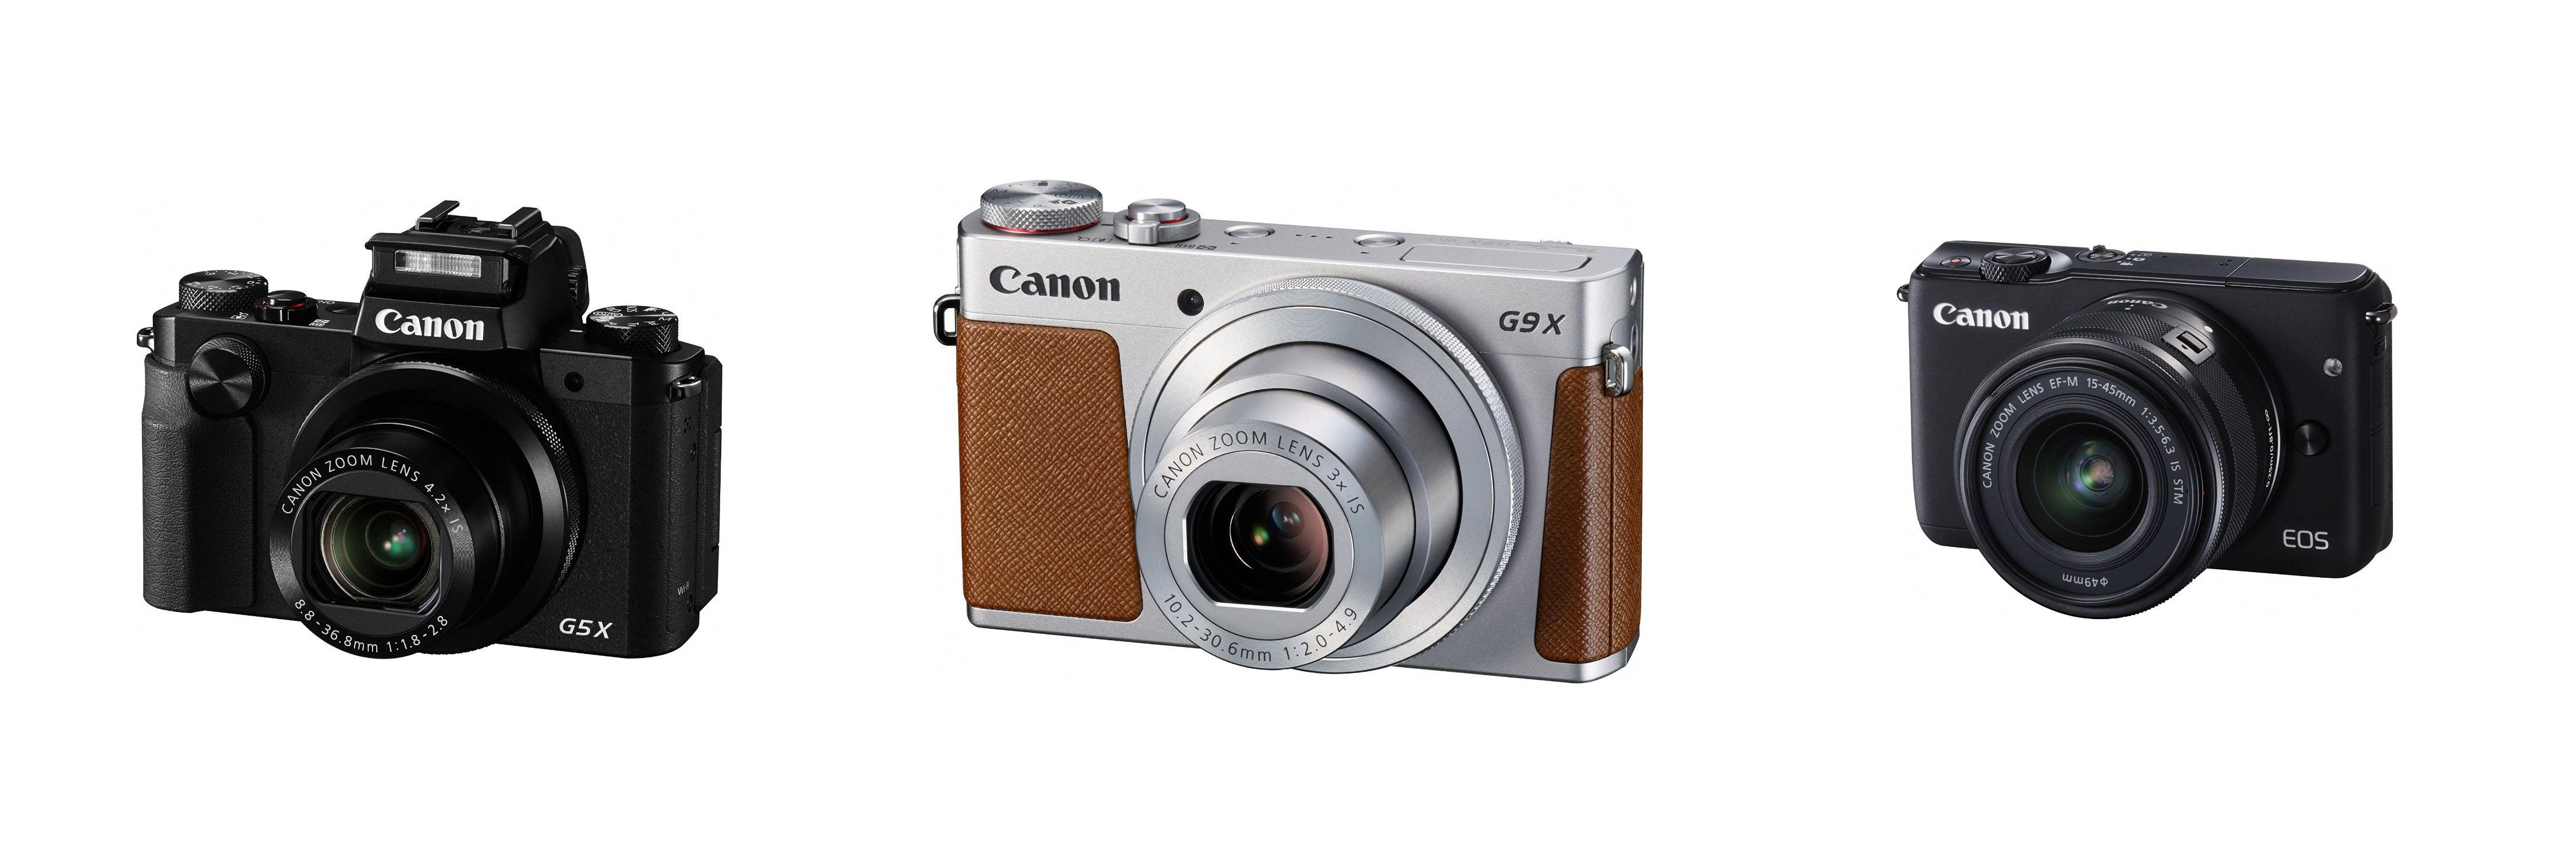 Canon EOS M10, G5 X un G9 X